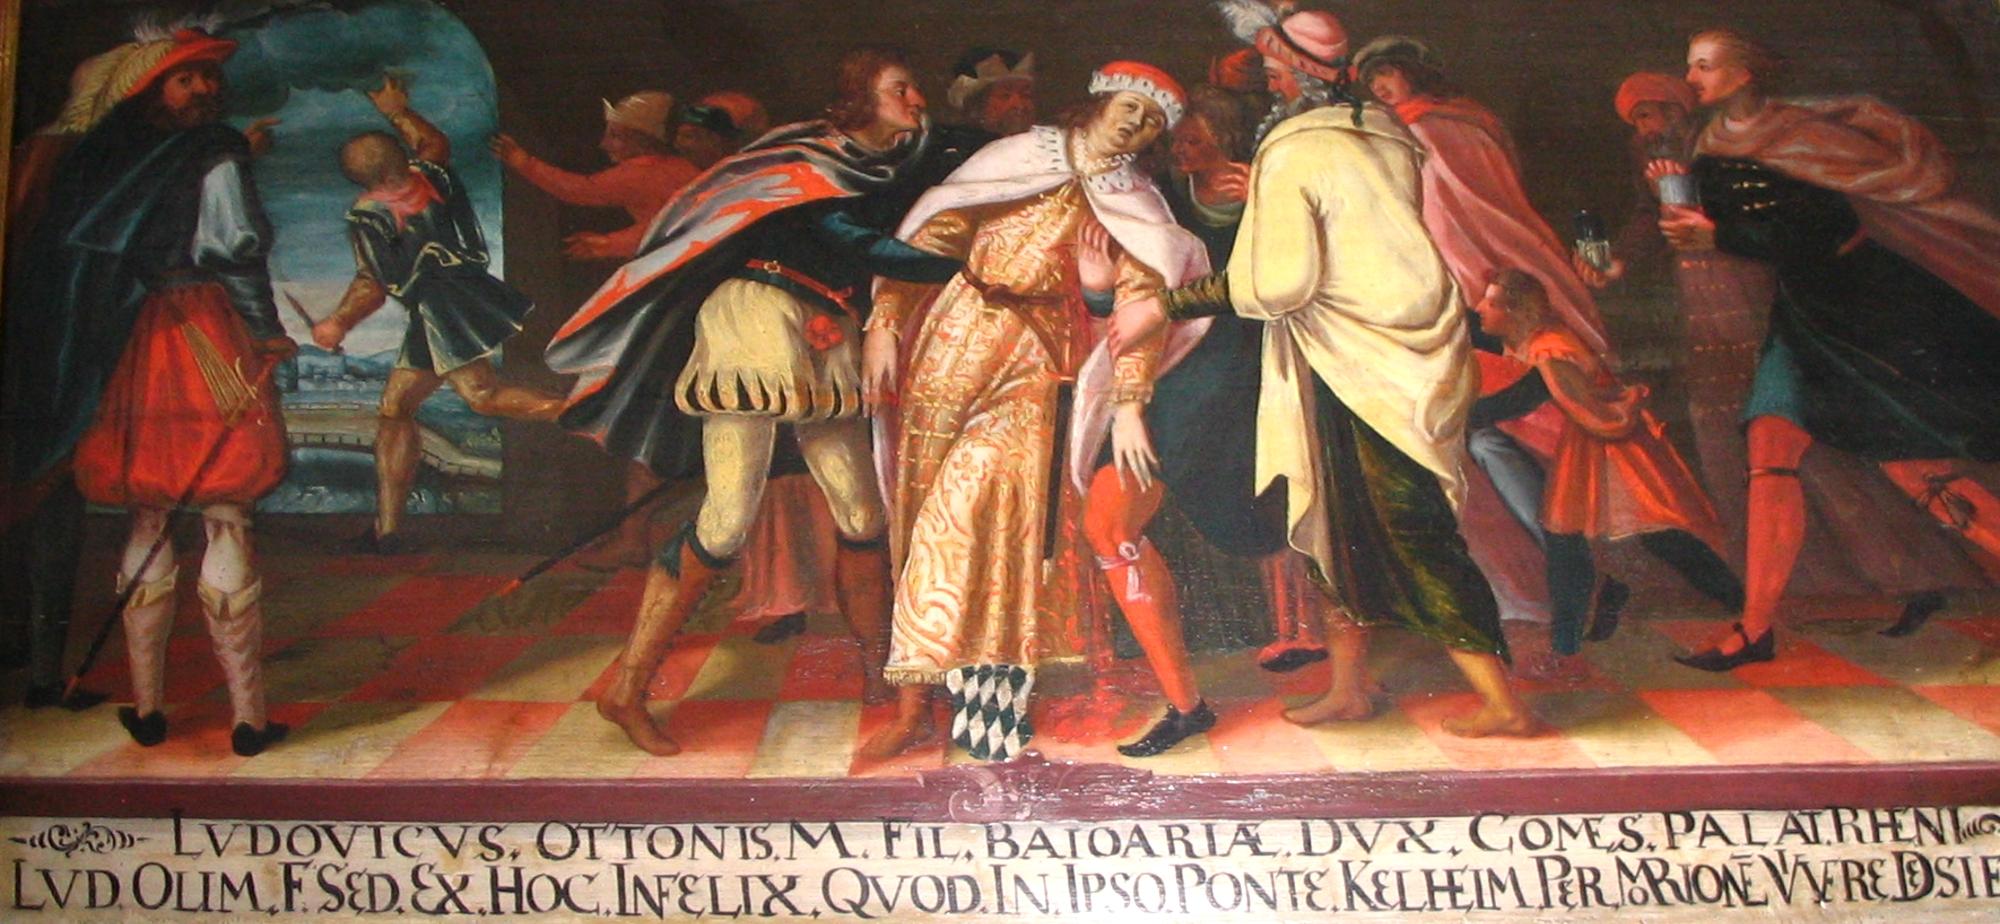 Louis I, Duke of Bavaria